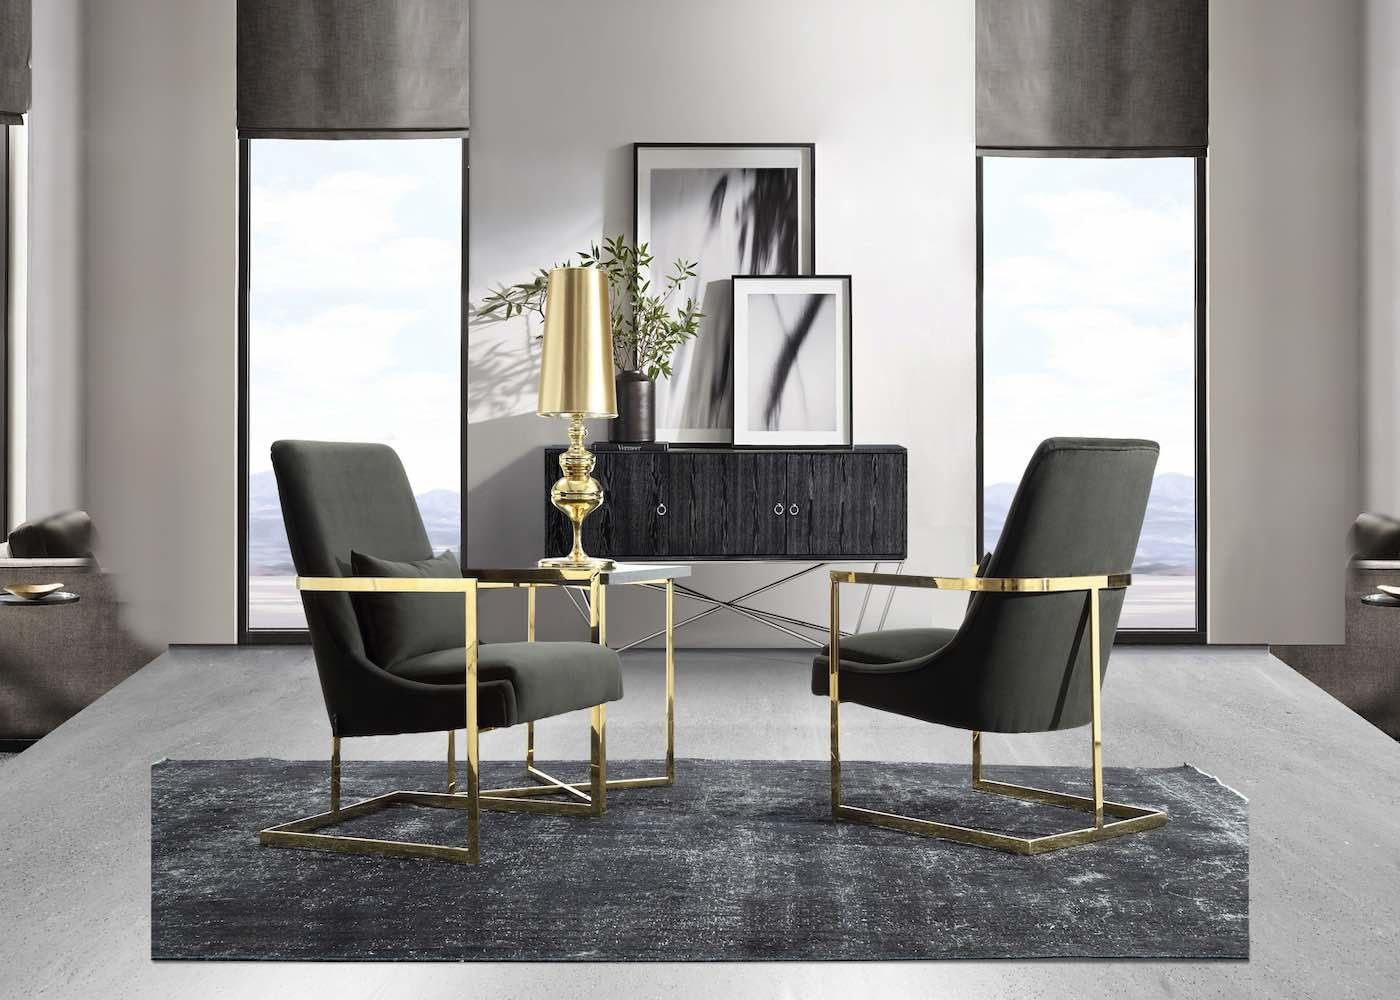 mazarin-ameublement-catalogue-produits-chaise-fauteuil-1